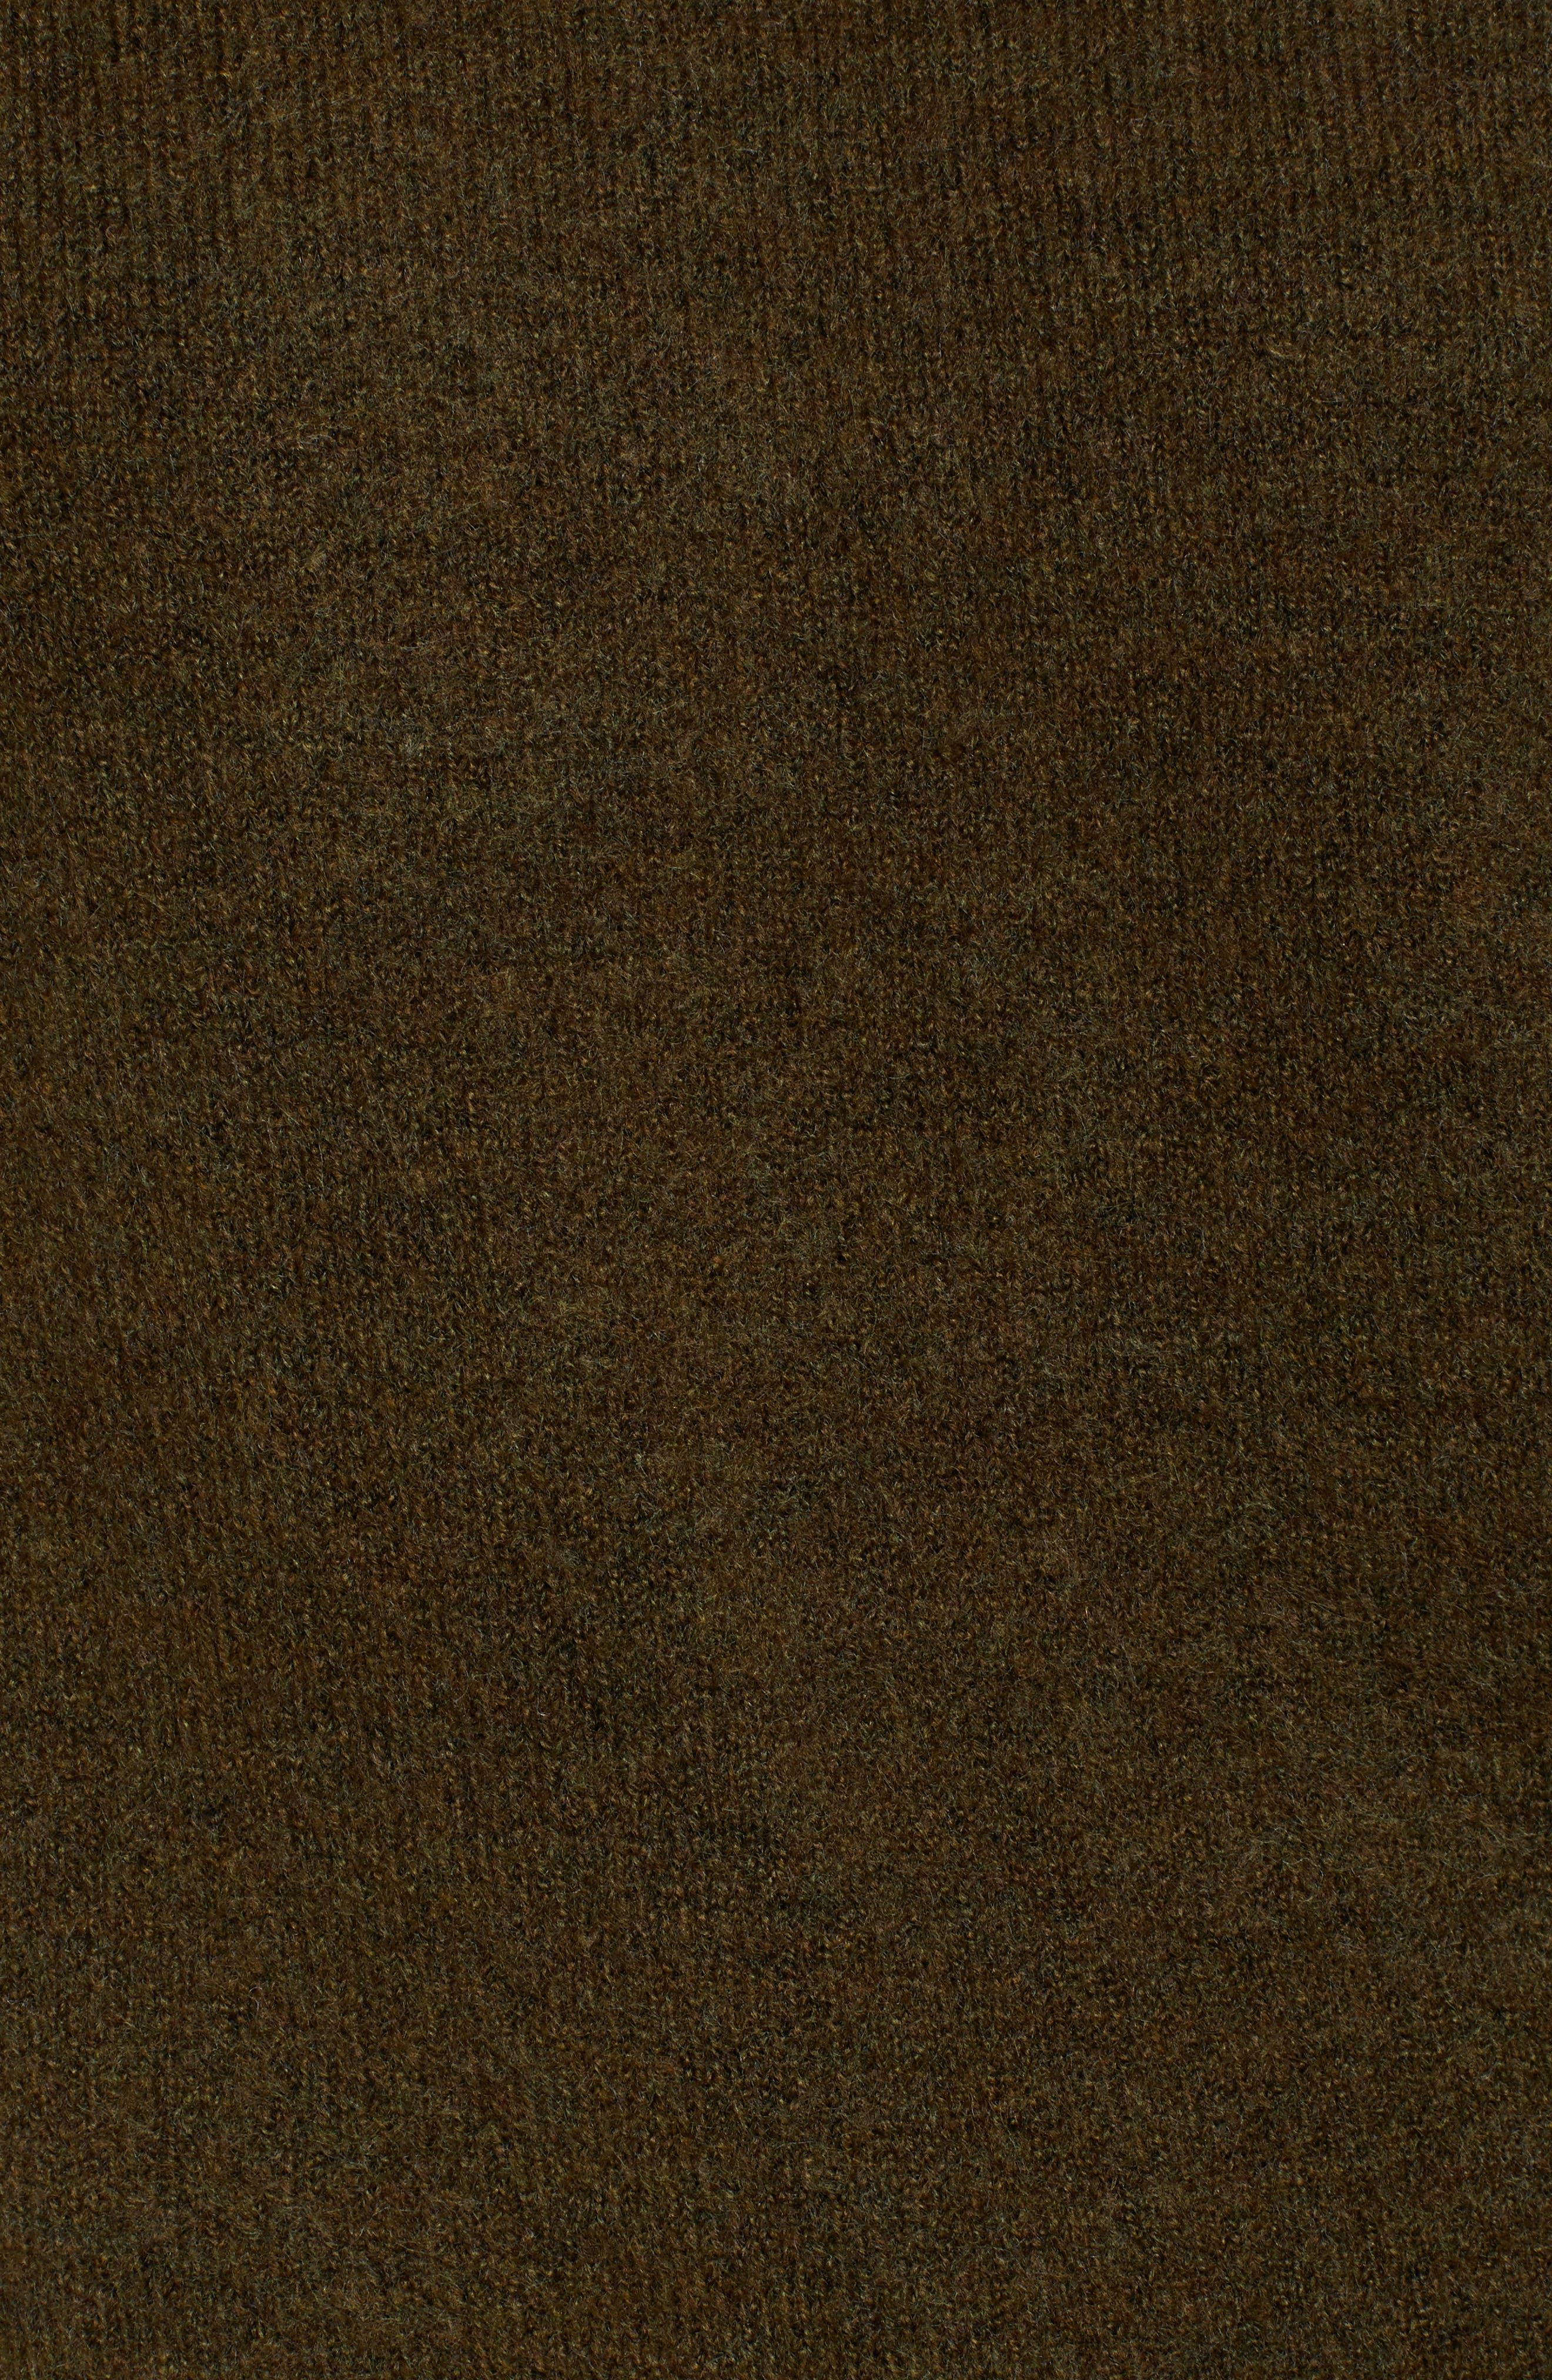 Cozy Mock Neck Sweater,                             Alternate thumbnail 5, color,                             301